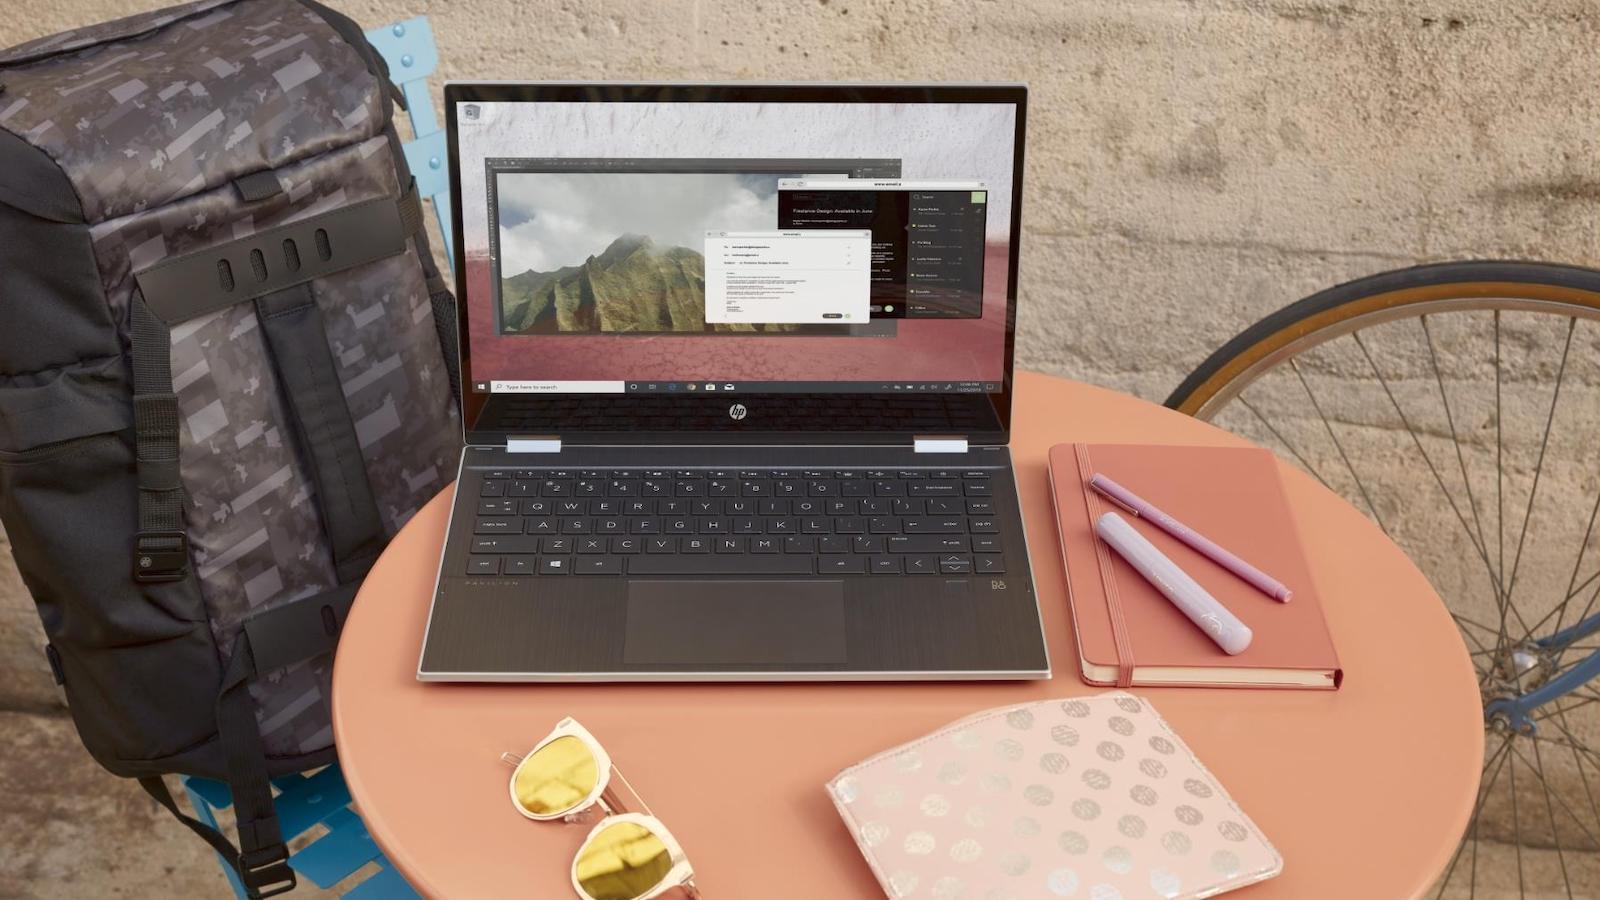 HP Pavilion x360 14 Series Convertible PCs